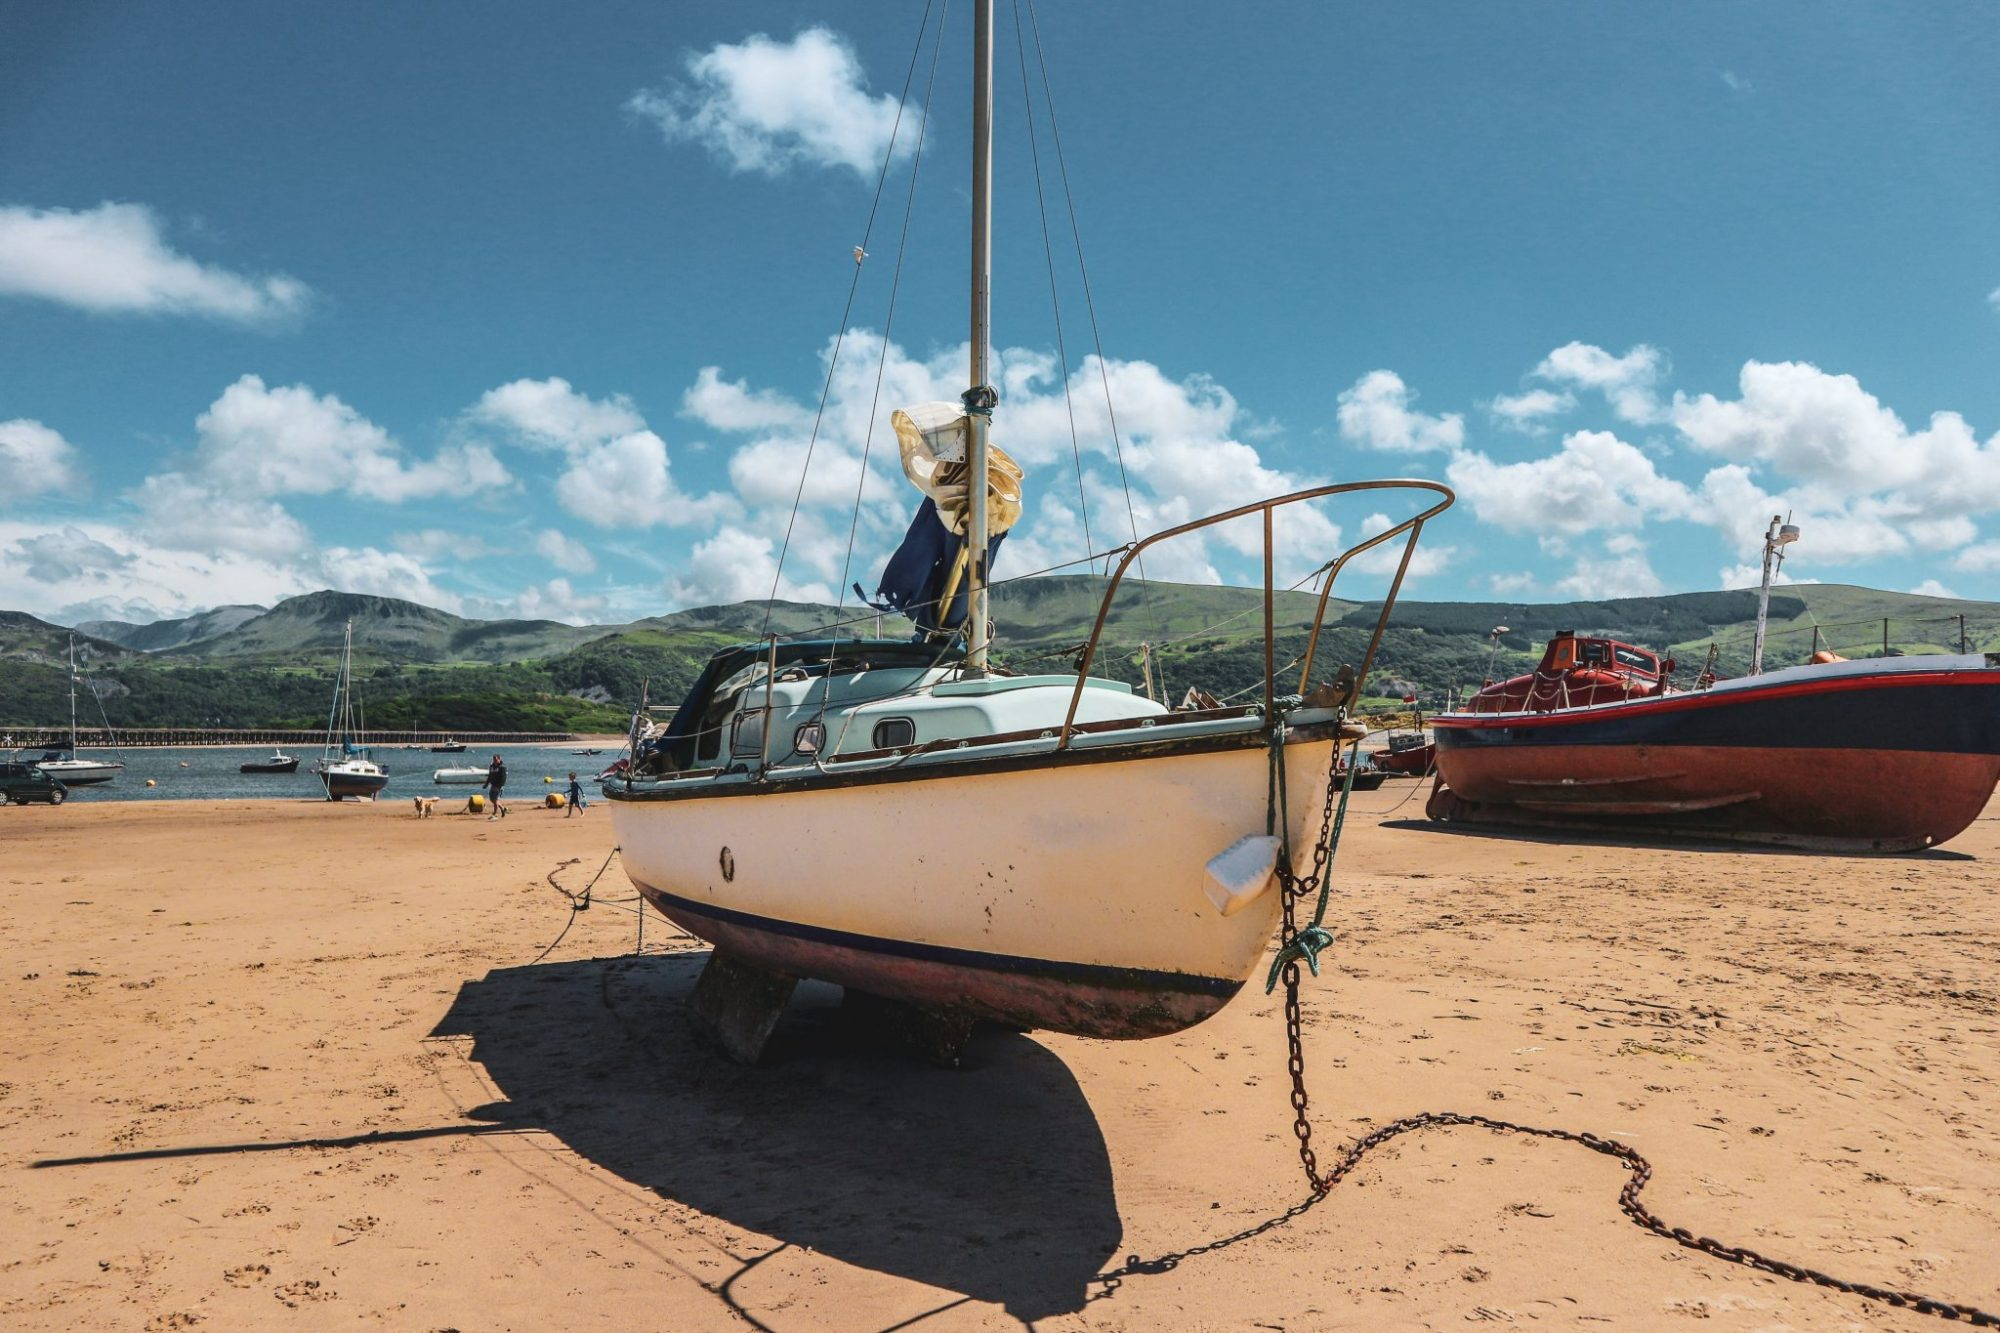 Bournemouth Beach • Seaside • Summer • Holiday • Boat